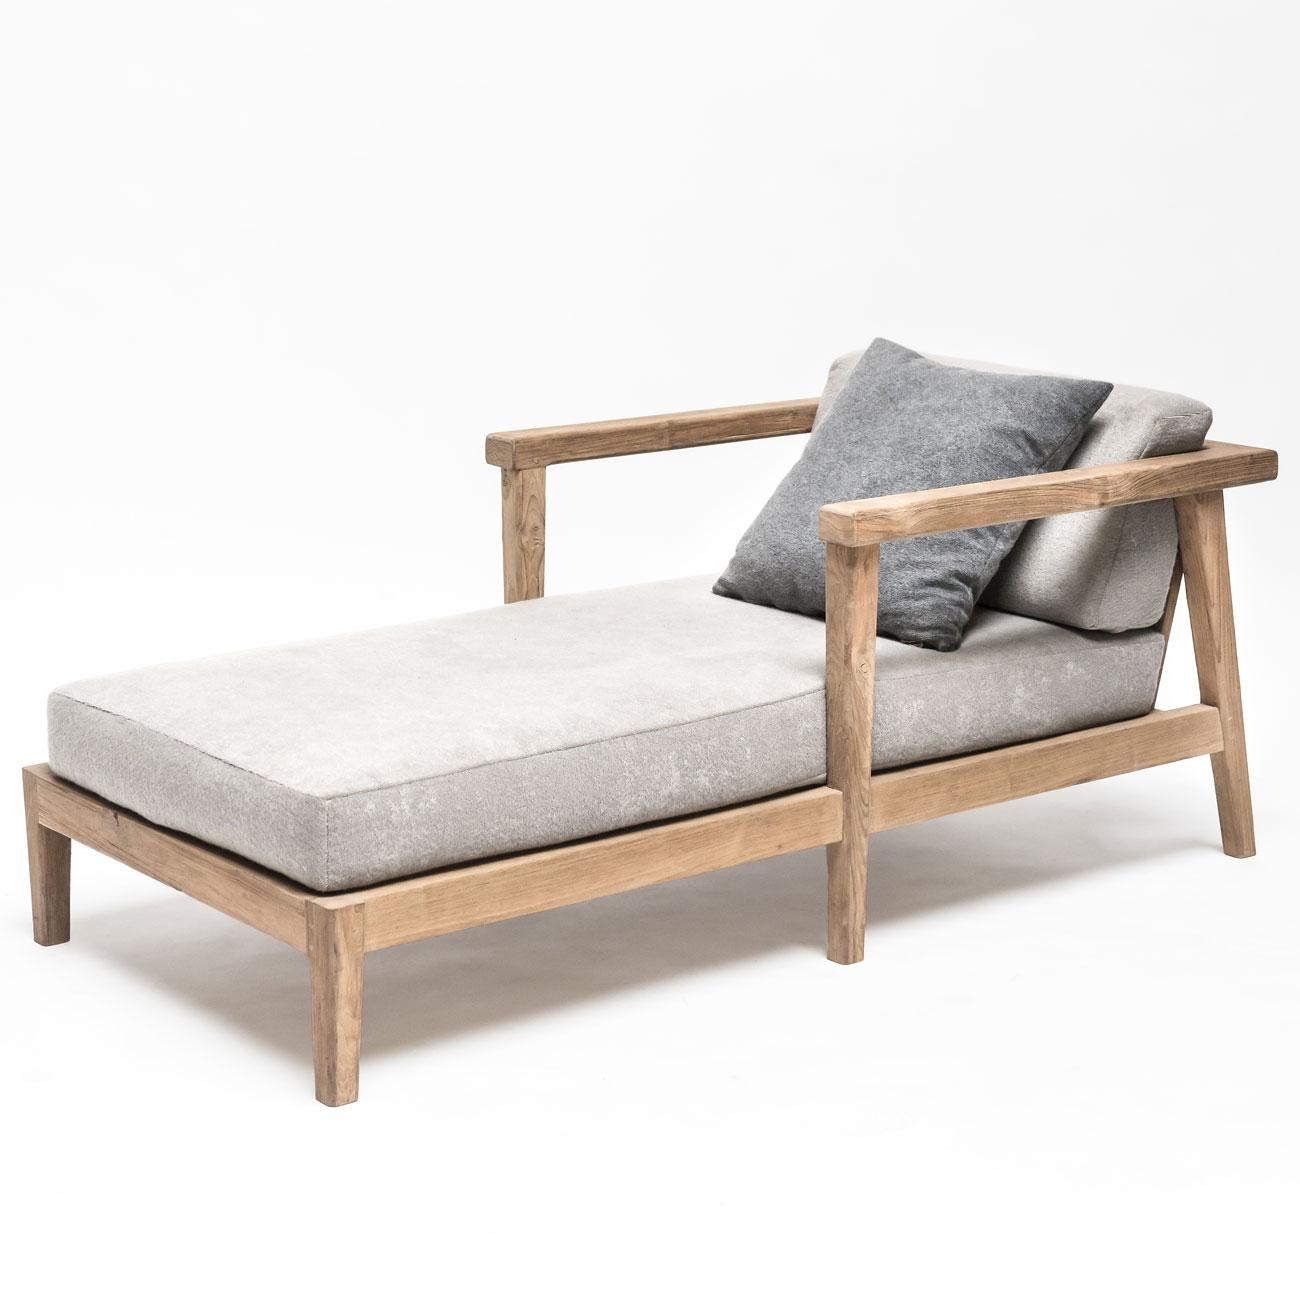 Gommaire copenhague chaise longue luxury outdoor living for Chaise longue beds